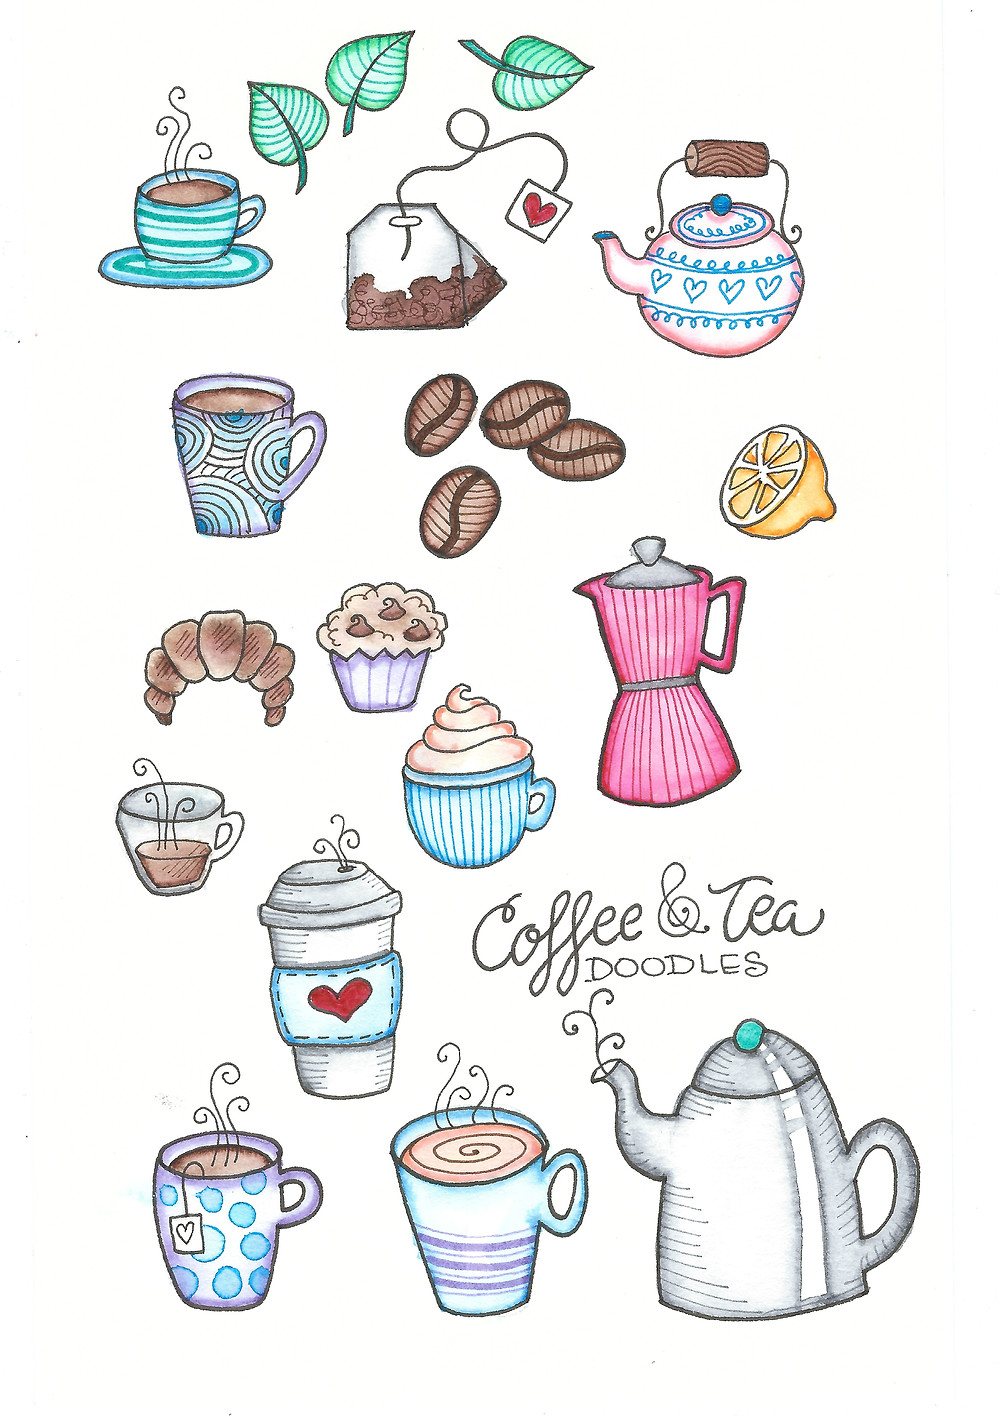 @mariebcreates #tombow #coffee coffee and tea doodles